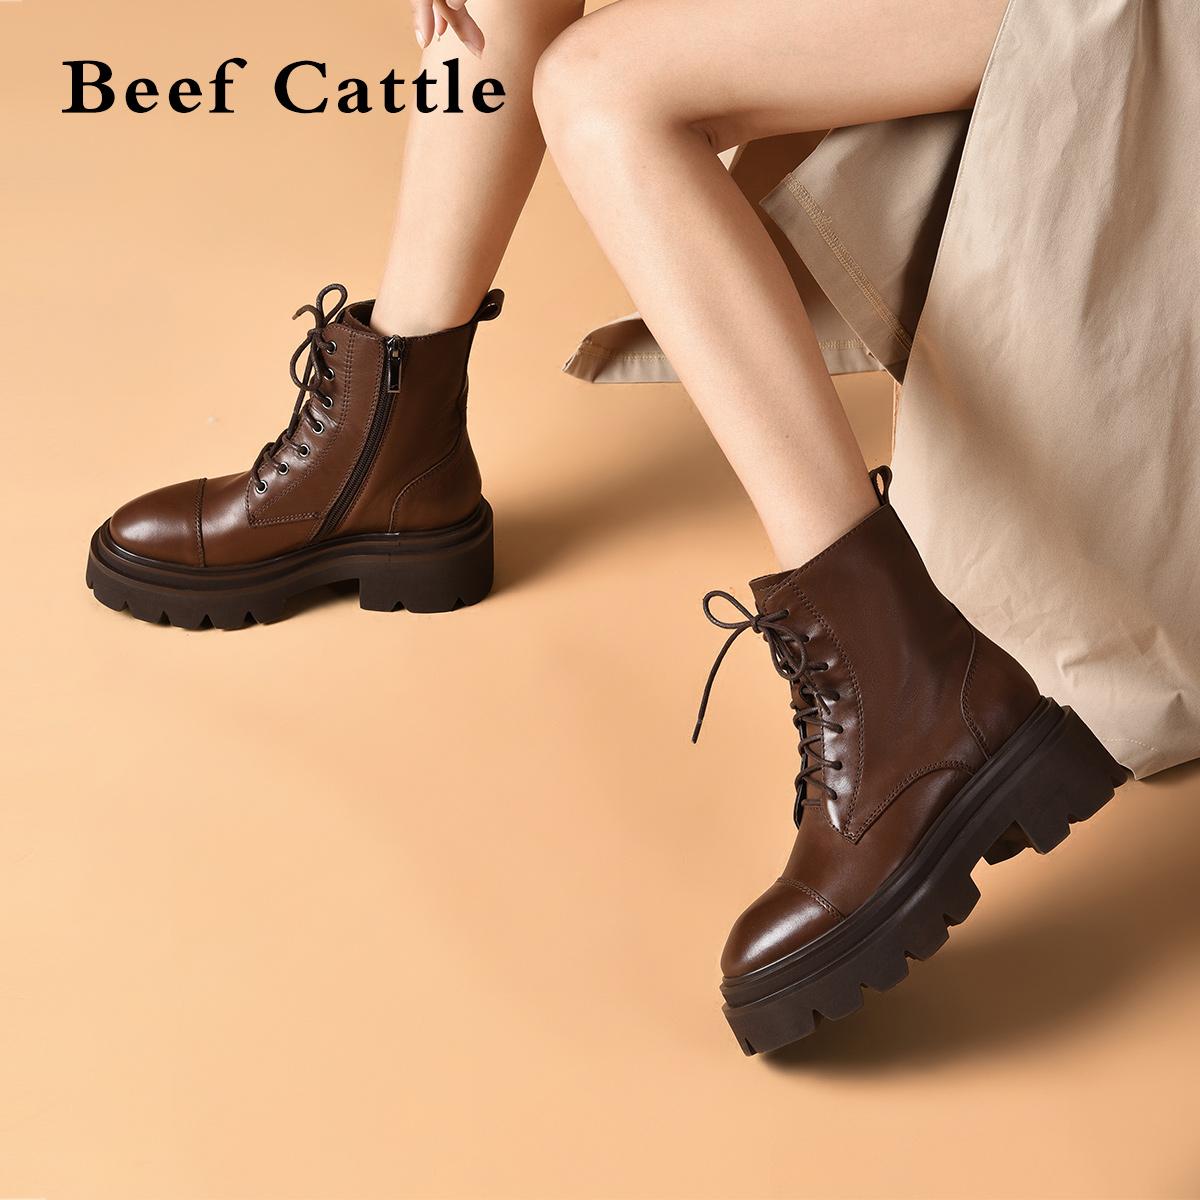 BF厚底马丁靴女英伦风中跟真皮系带短靴2021秋冬新款百搭休闲靴子